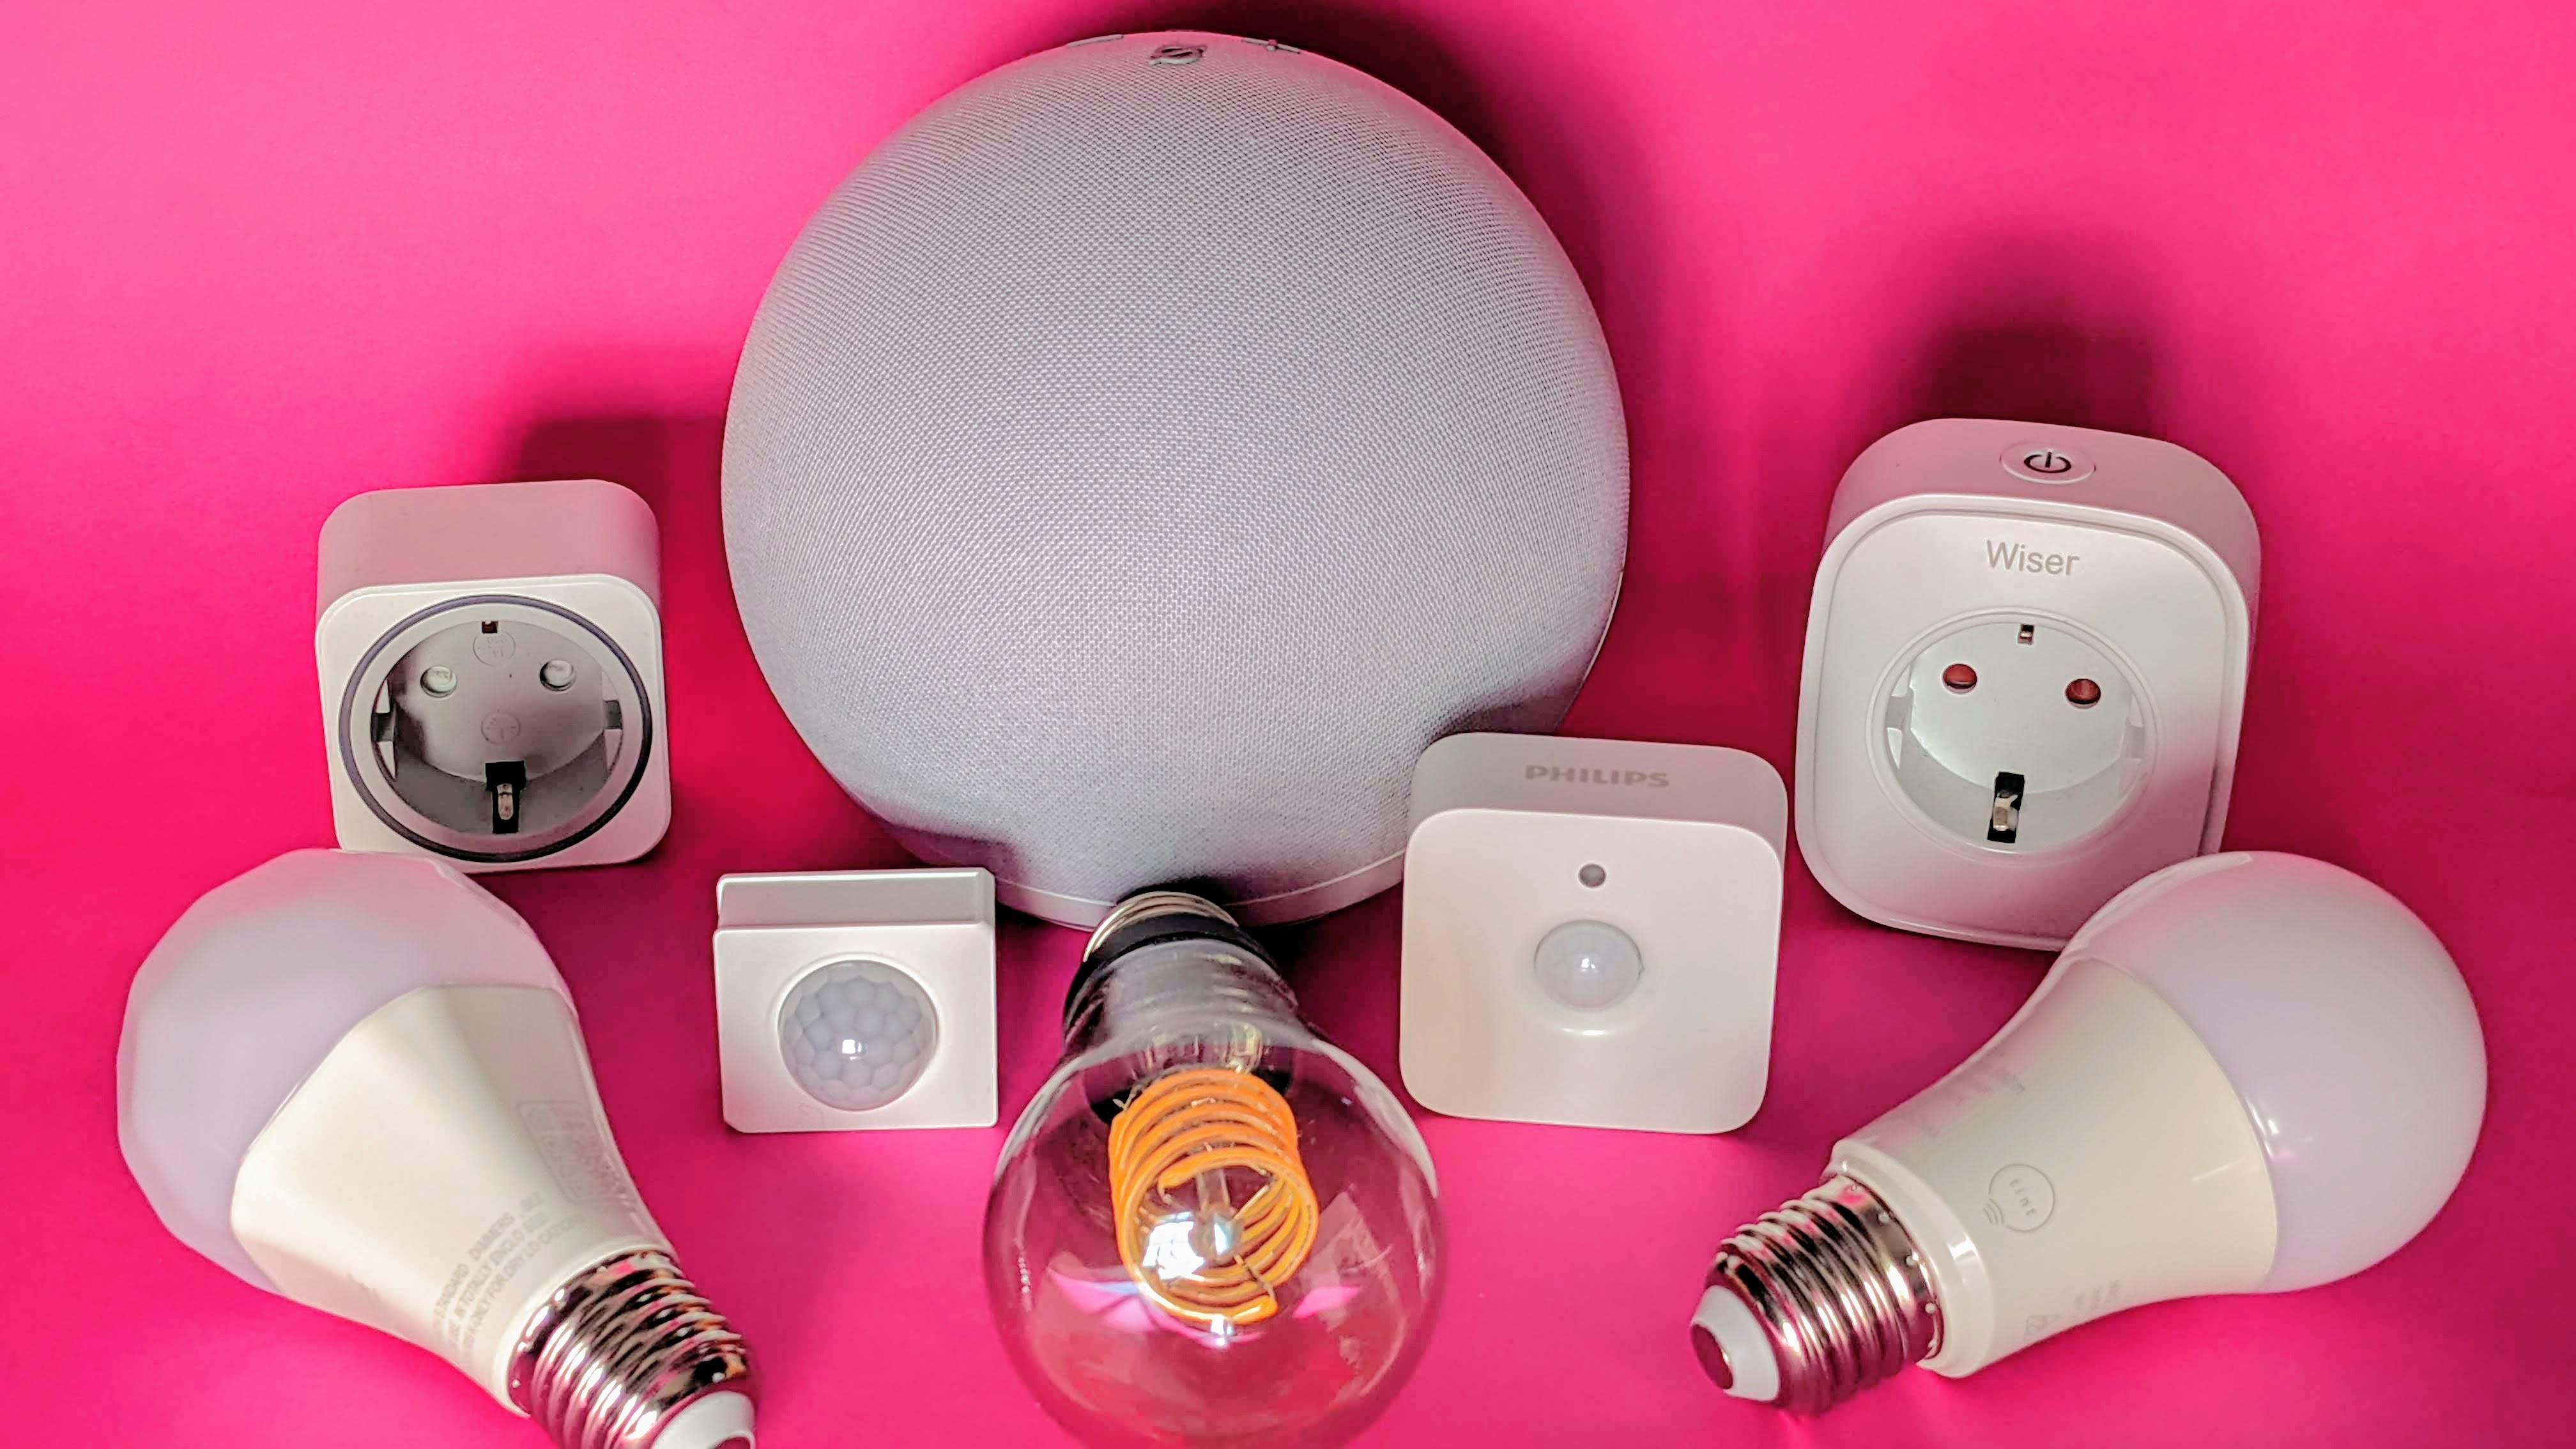 Amazon Echo als Smart-Home-Zentrale: Philips Hue und Co. ohne Hub über Zigbee verbinden